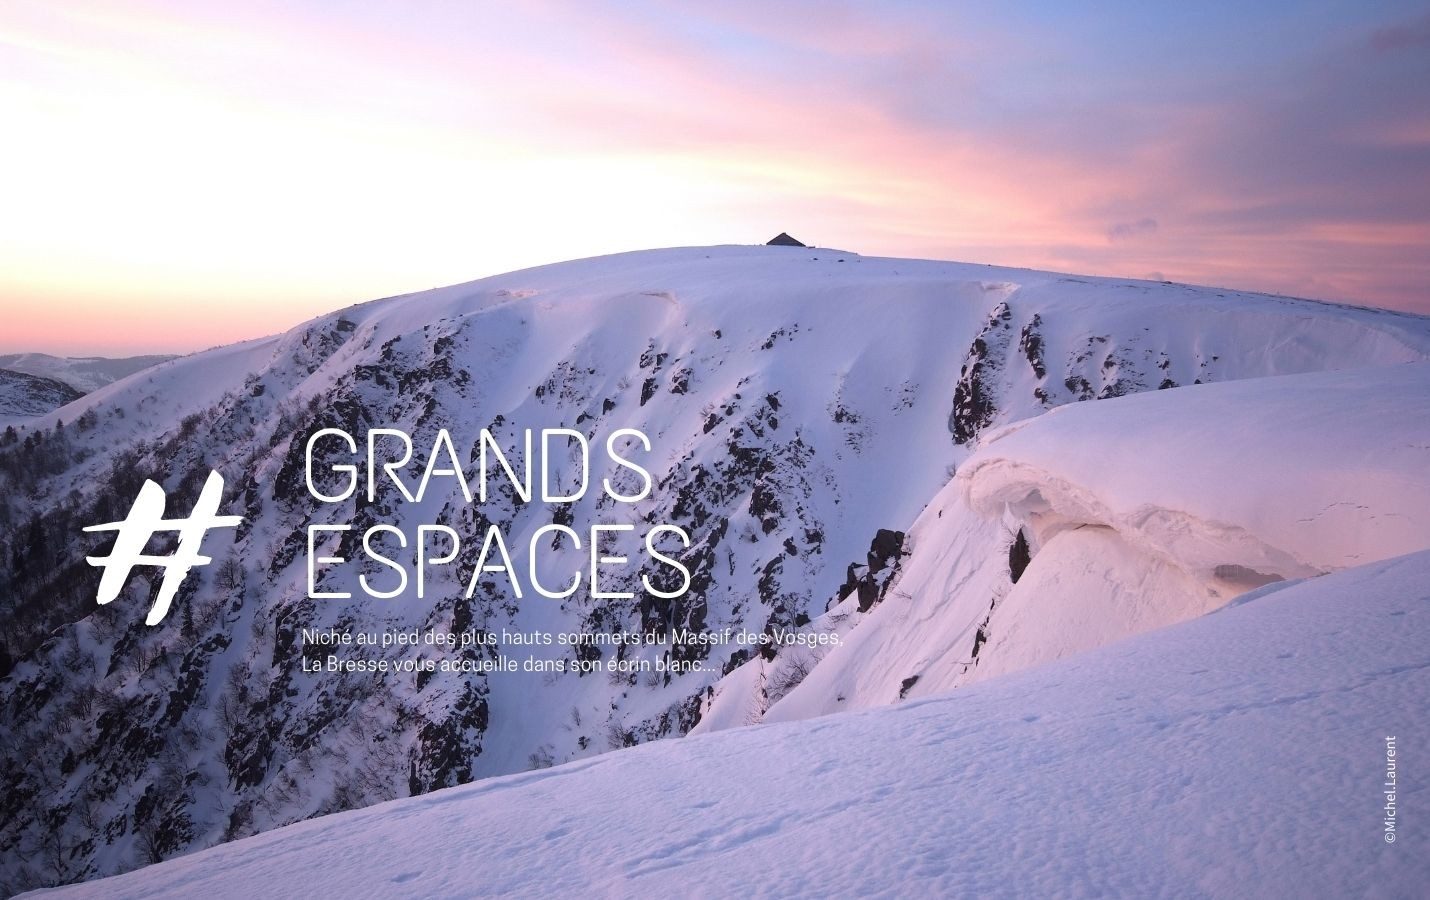 La Bresse Hautes-Vosges #GrandsEspaces  ©Michel Laurent